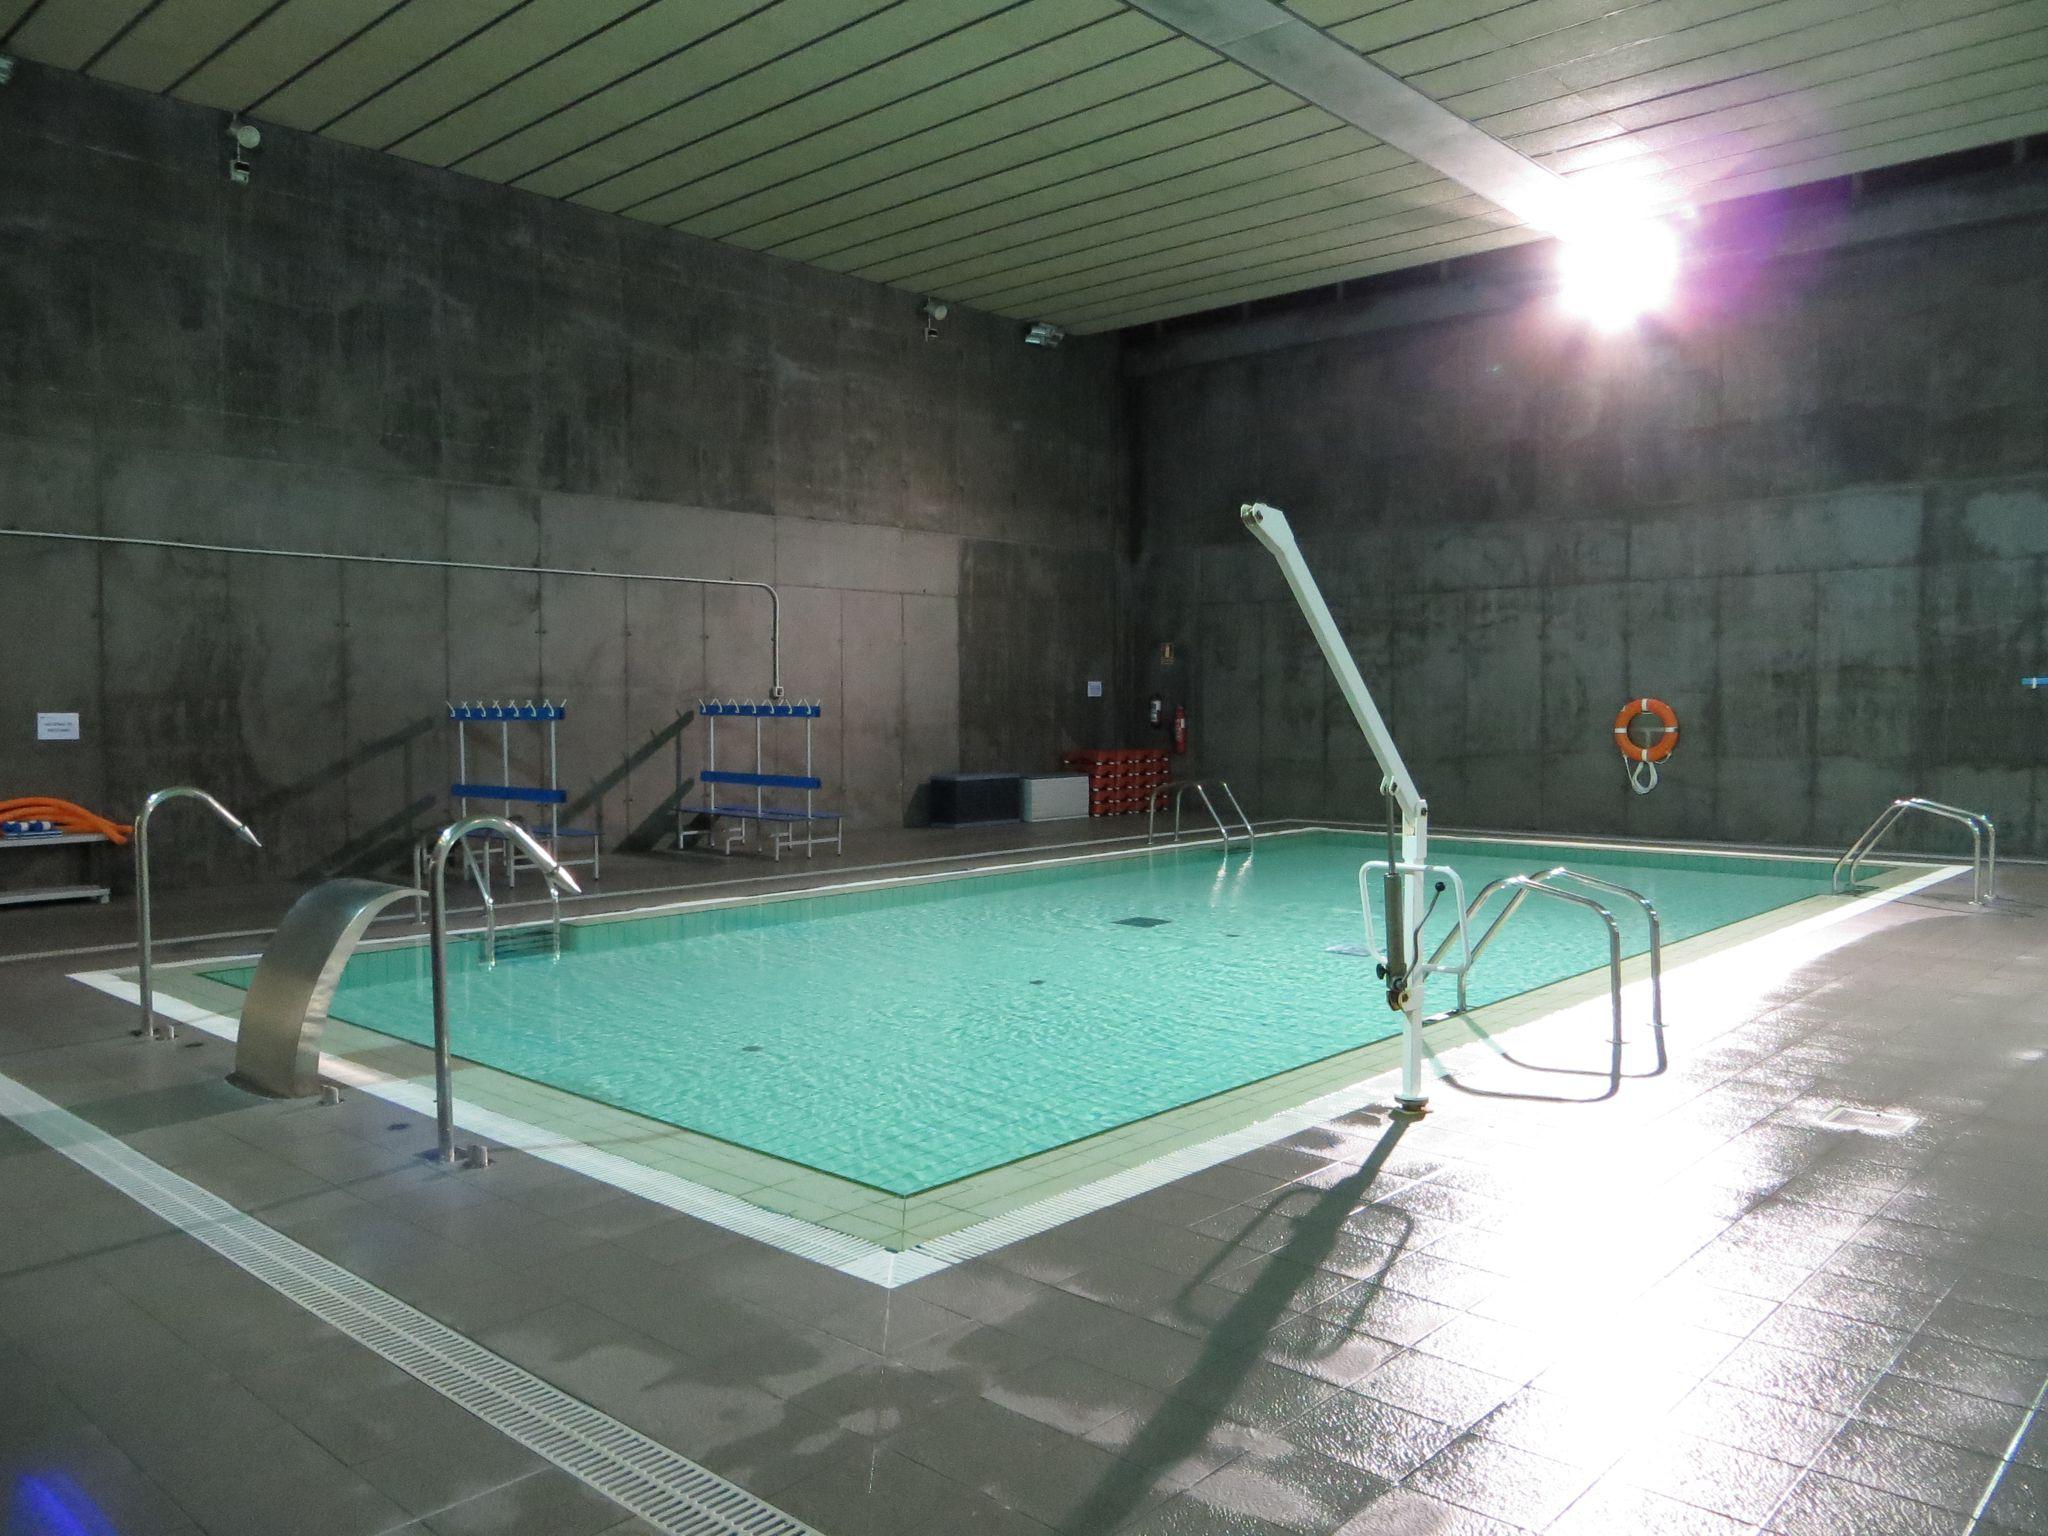 piscina duquesa villahermosa centro deportivo municipal